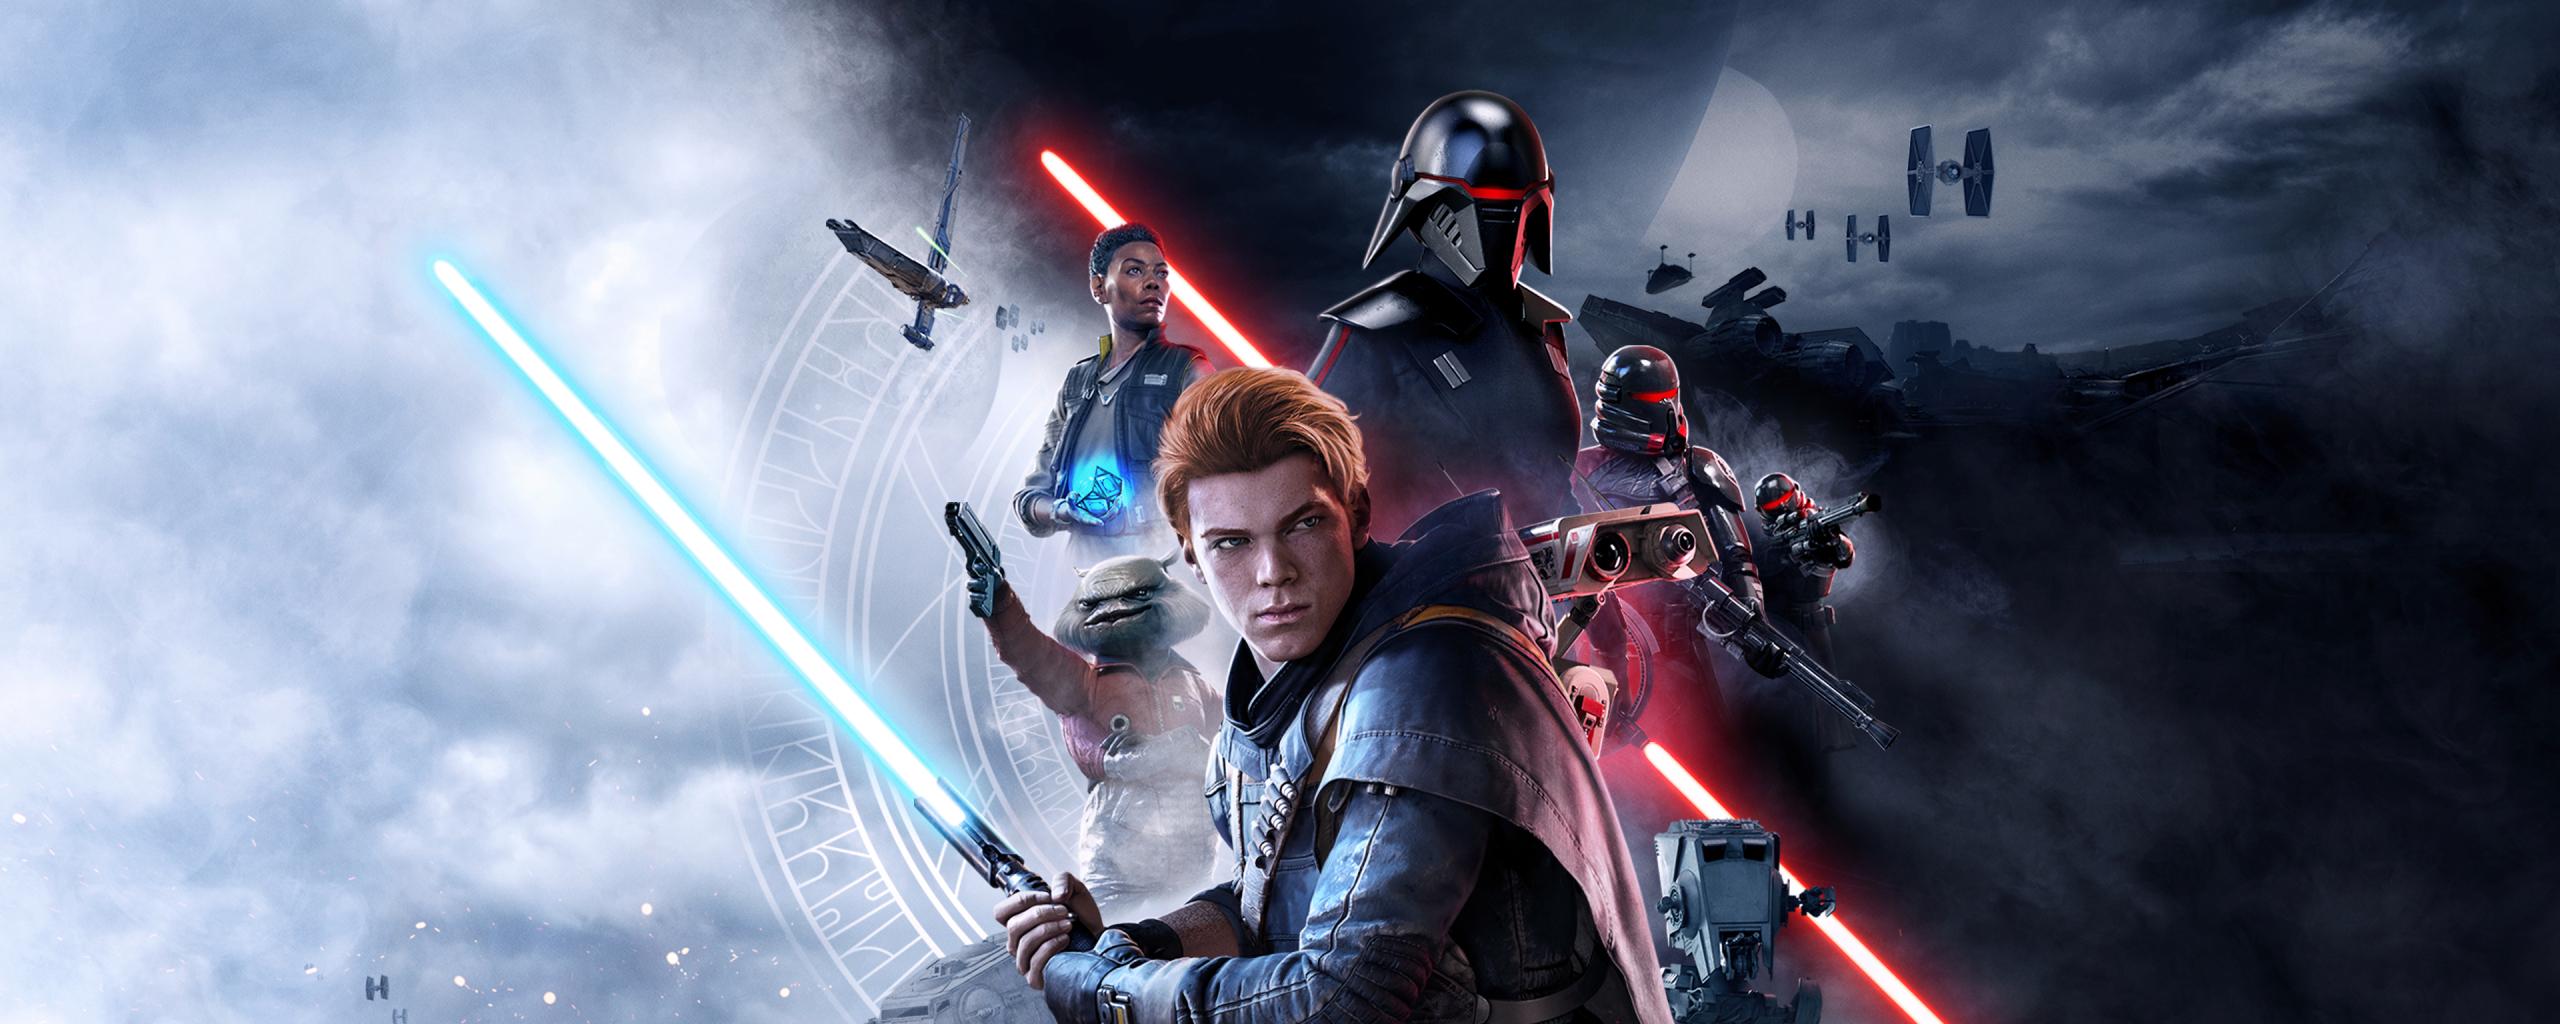 2560x1024 Star Wars Jedi Fallen Order Poster 2019 ...